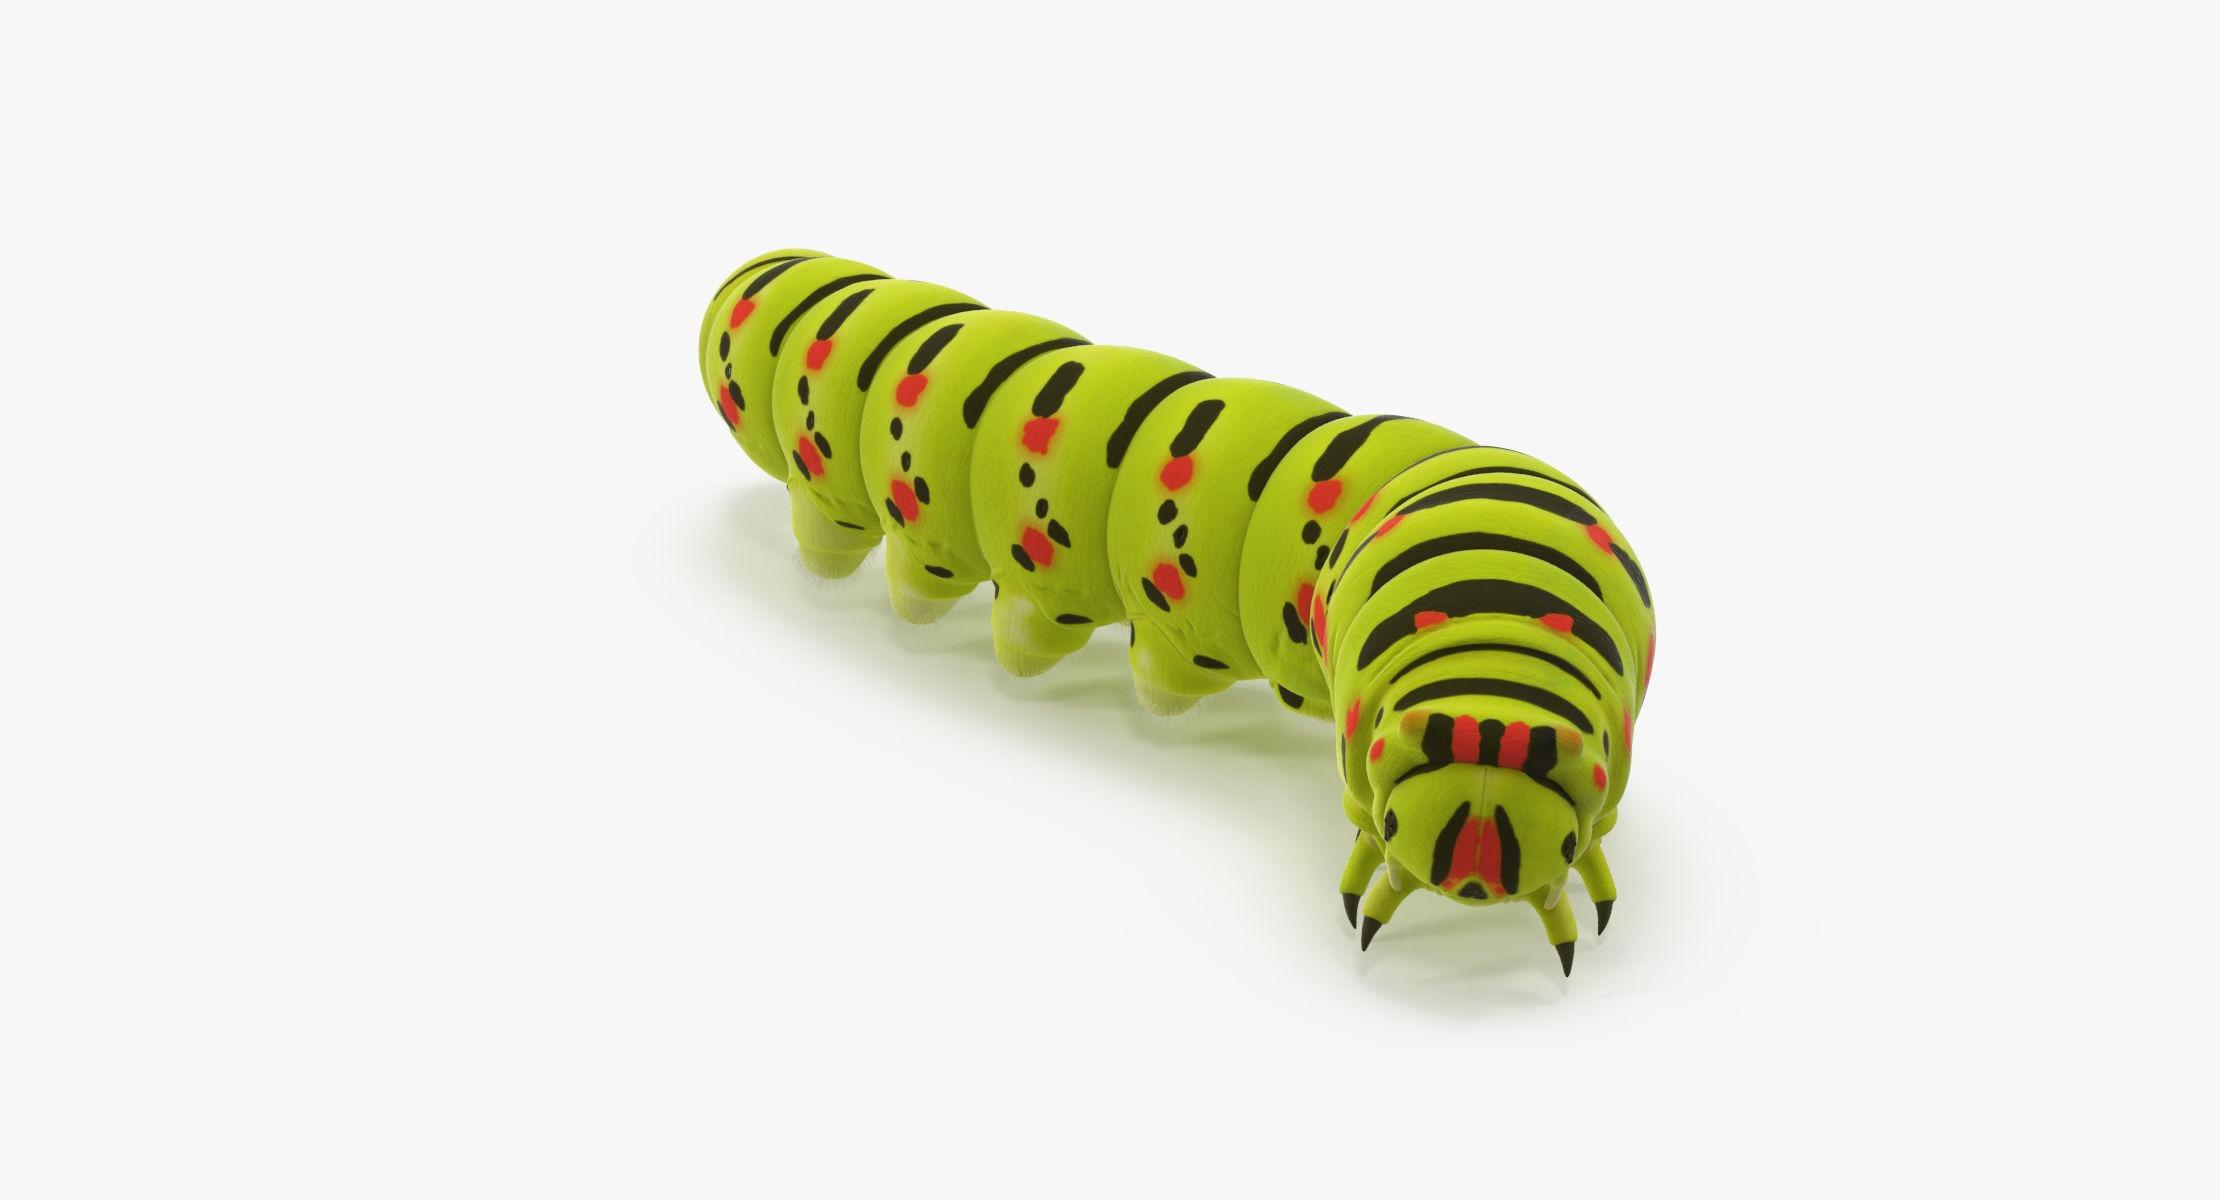 Caterpillar Rigged - reel 1